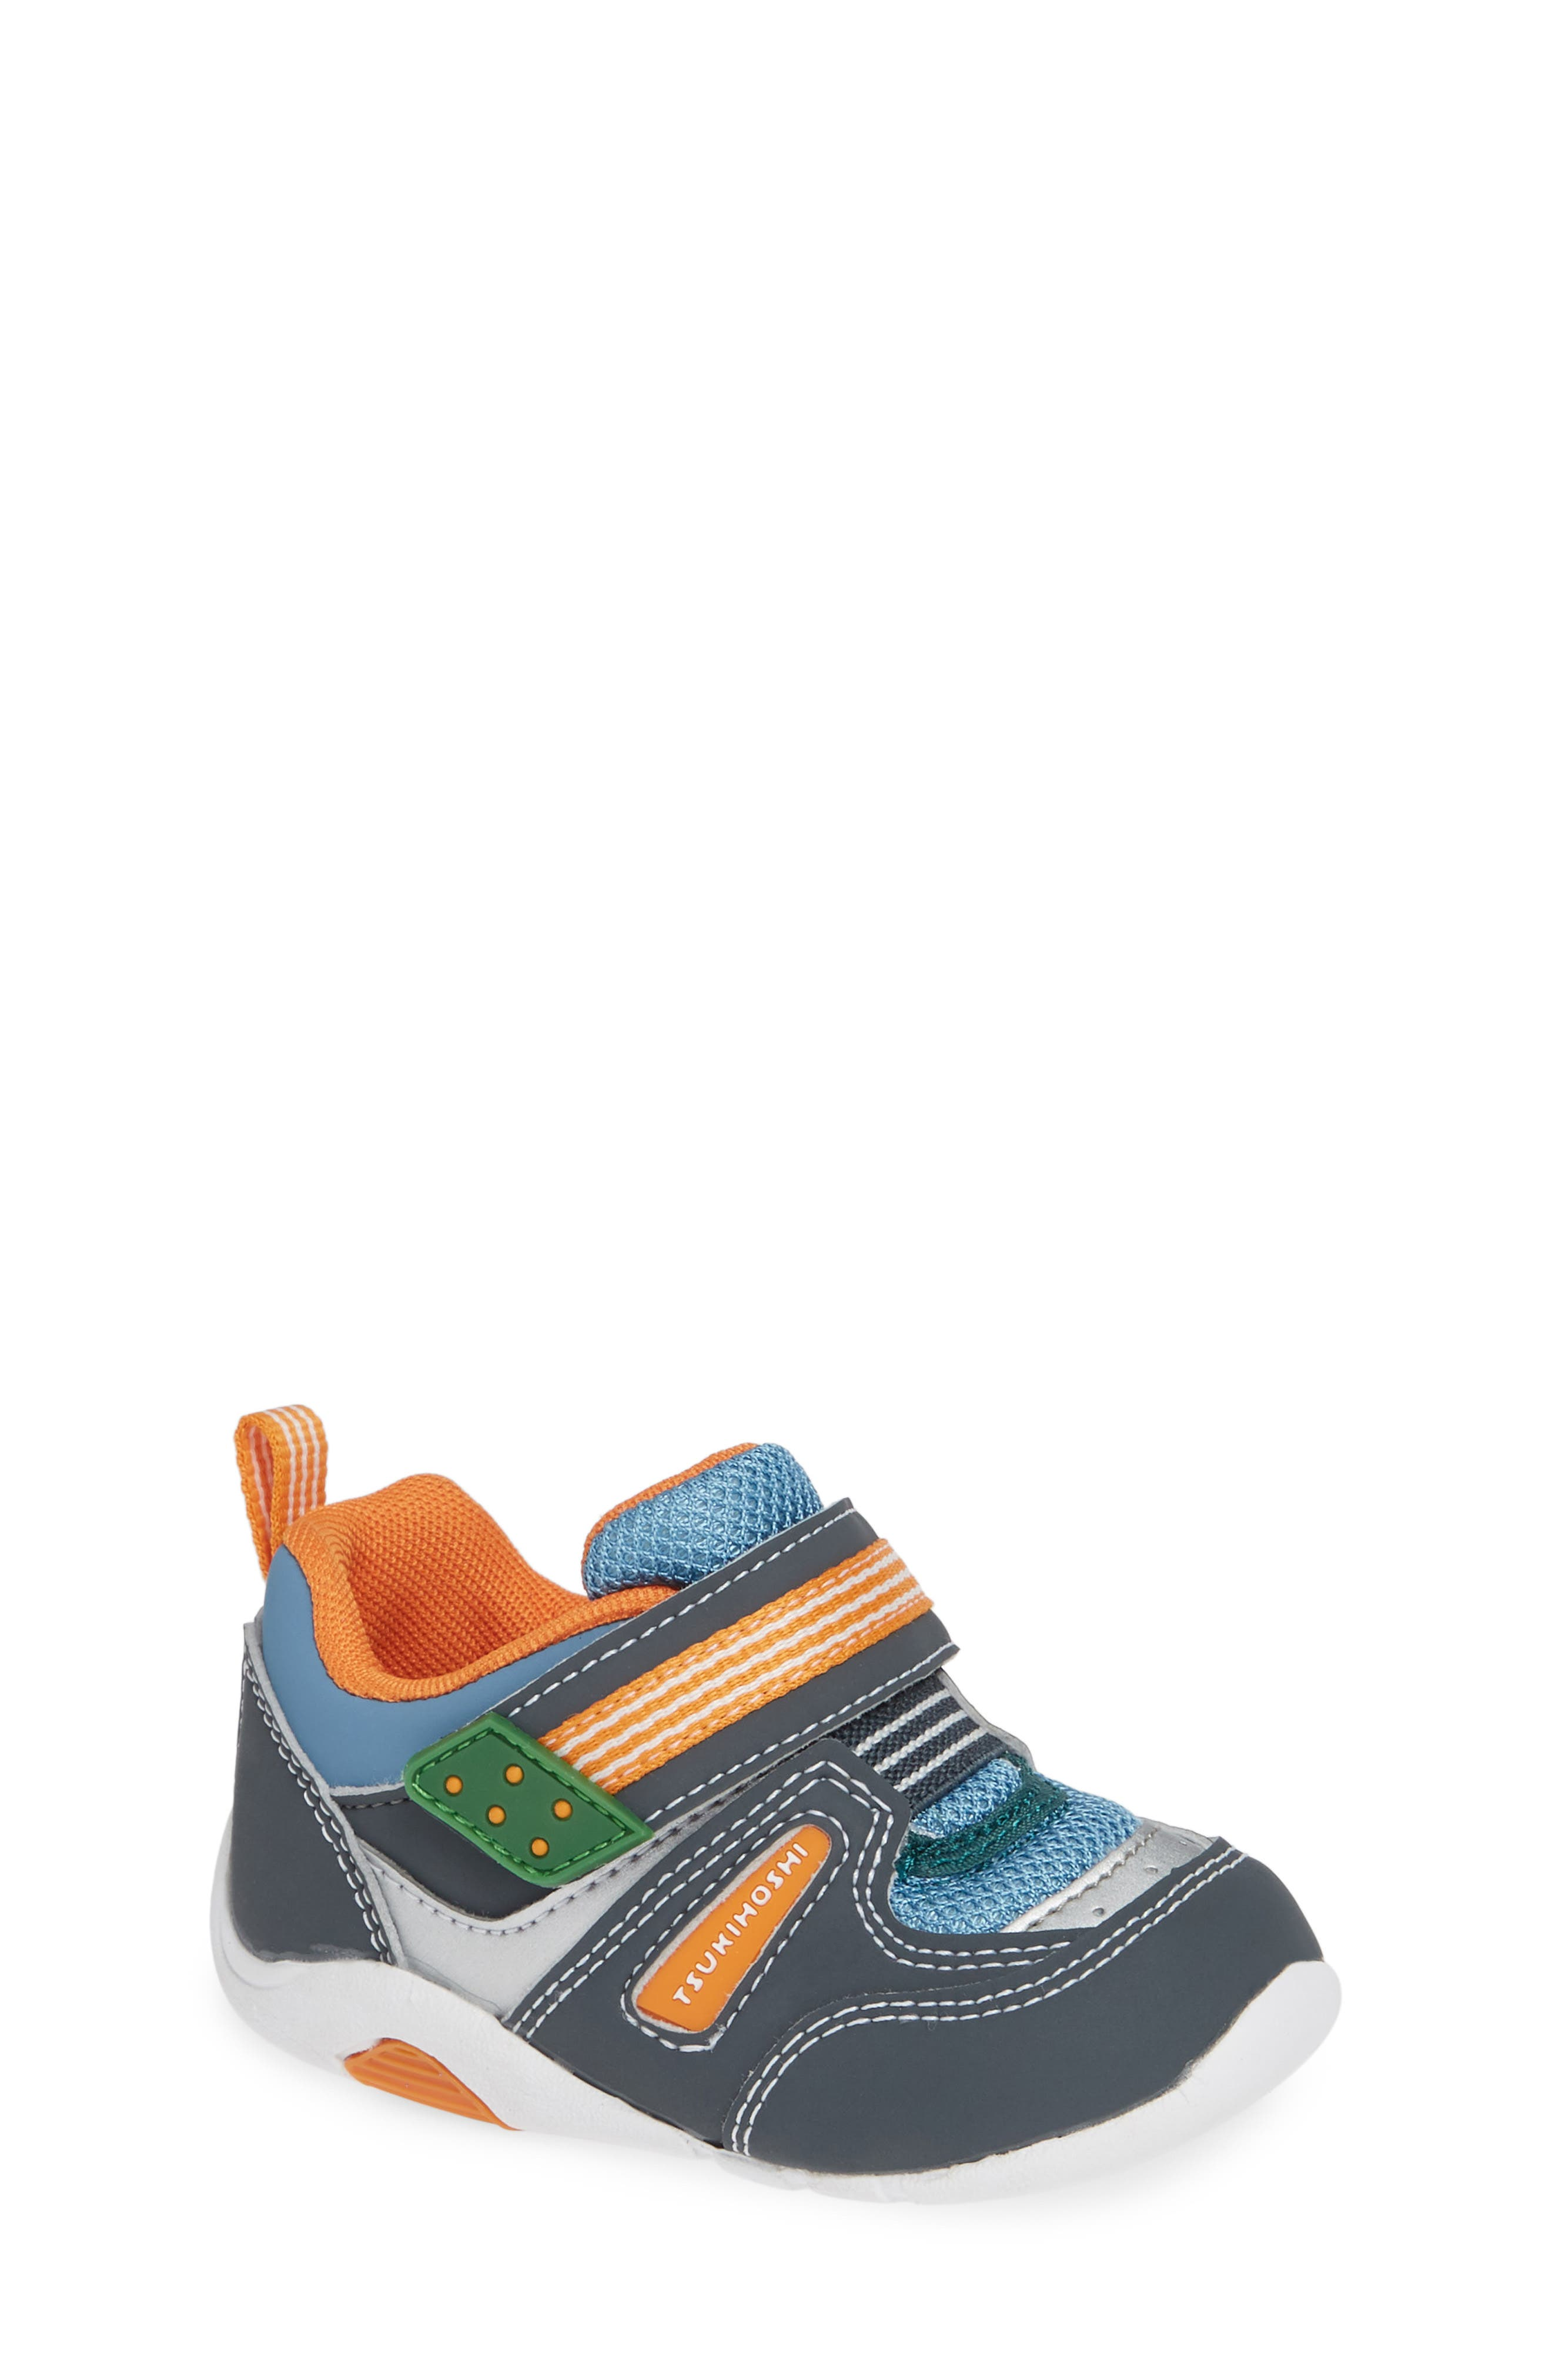 TSUKIHOSHI Unisex-Child Speed Sneaker